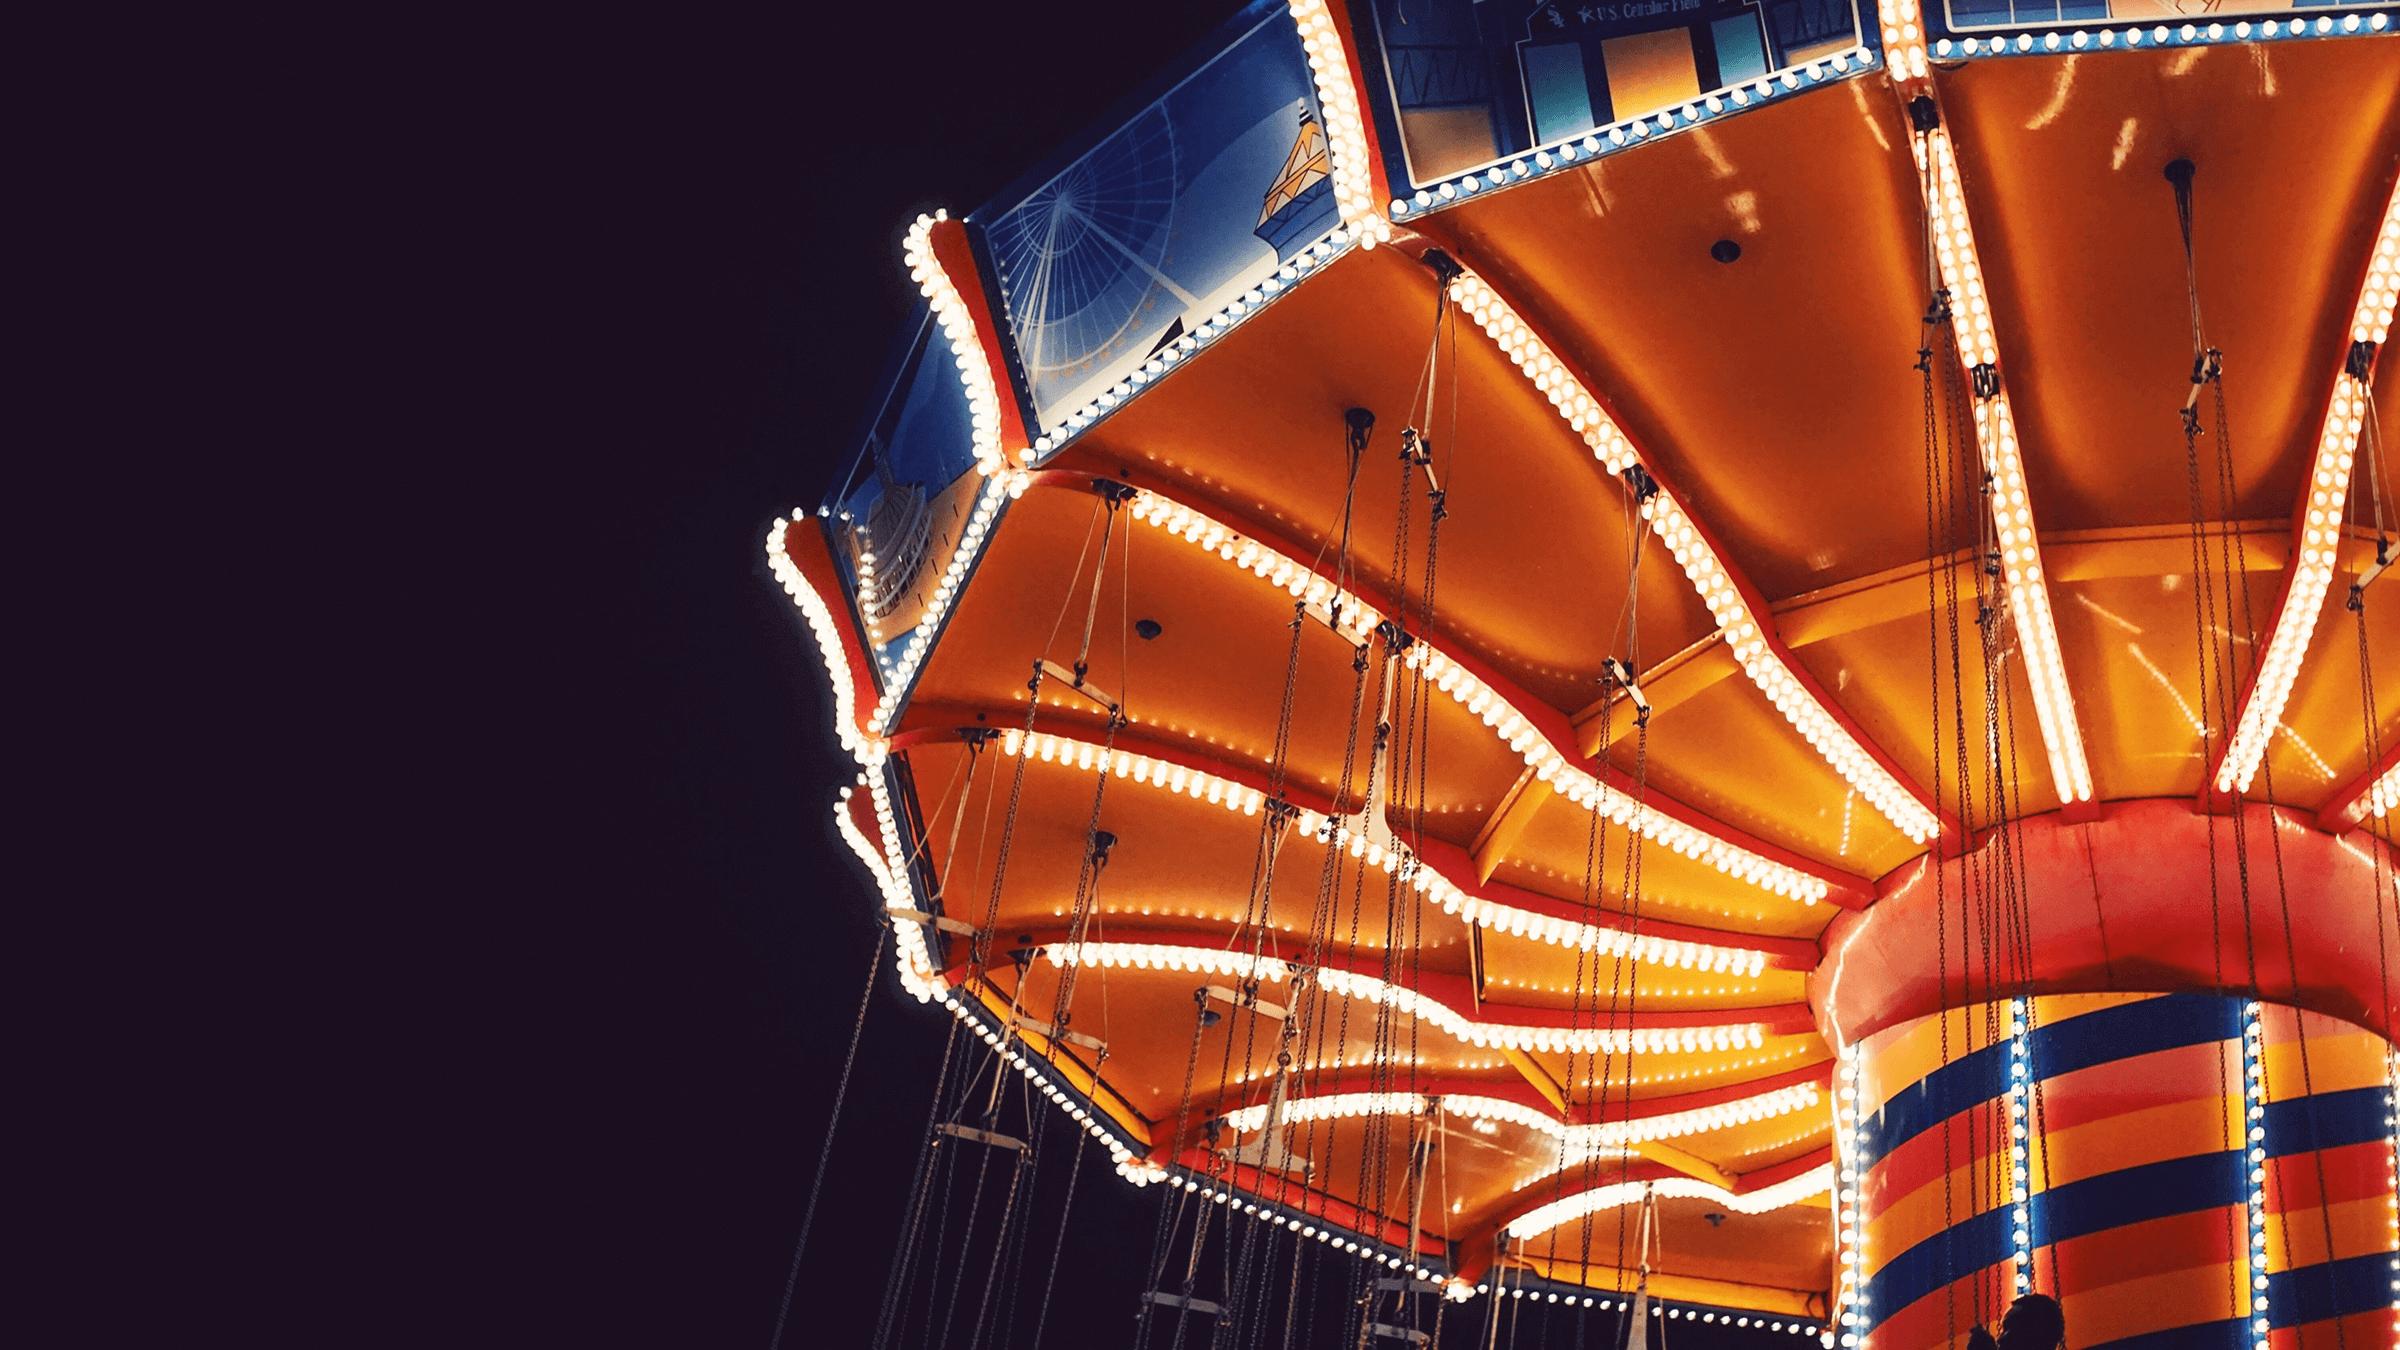 A carousel.